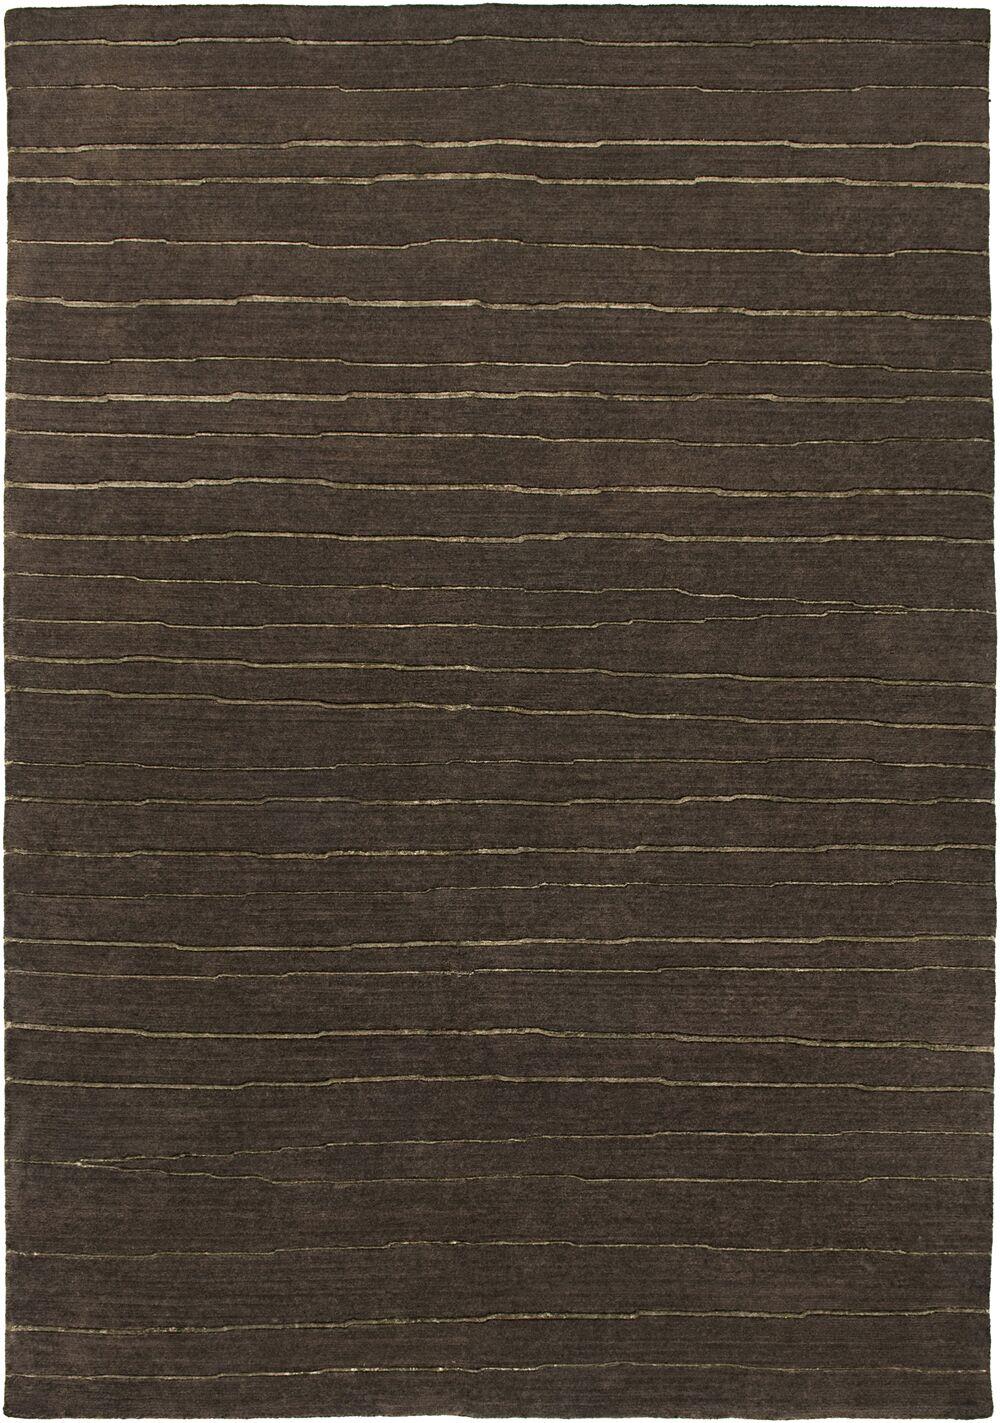 Visnagar Hand-Knotted Dark Brown Area Rug Rug Size: Rectangle 2' x 3'